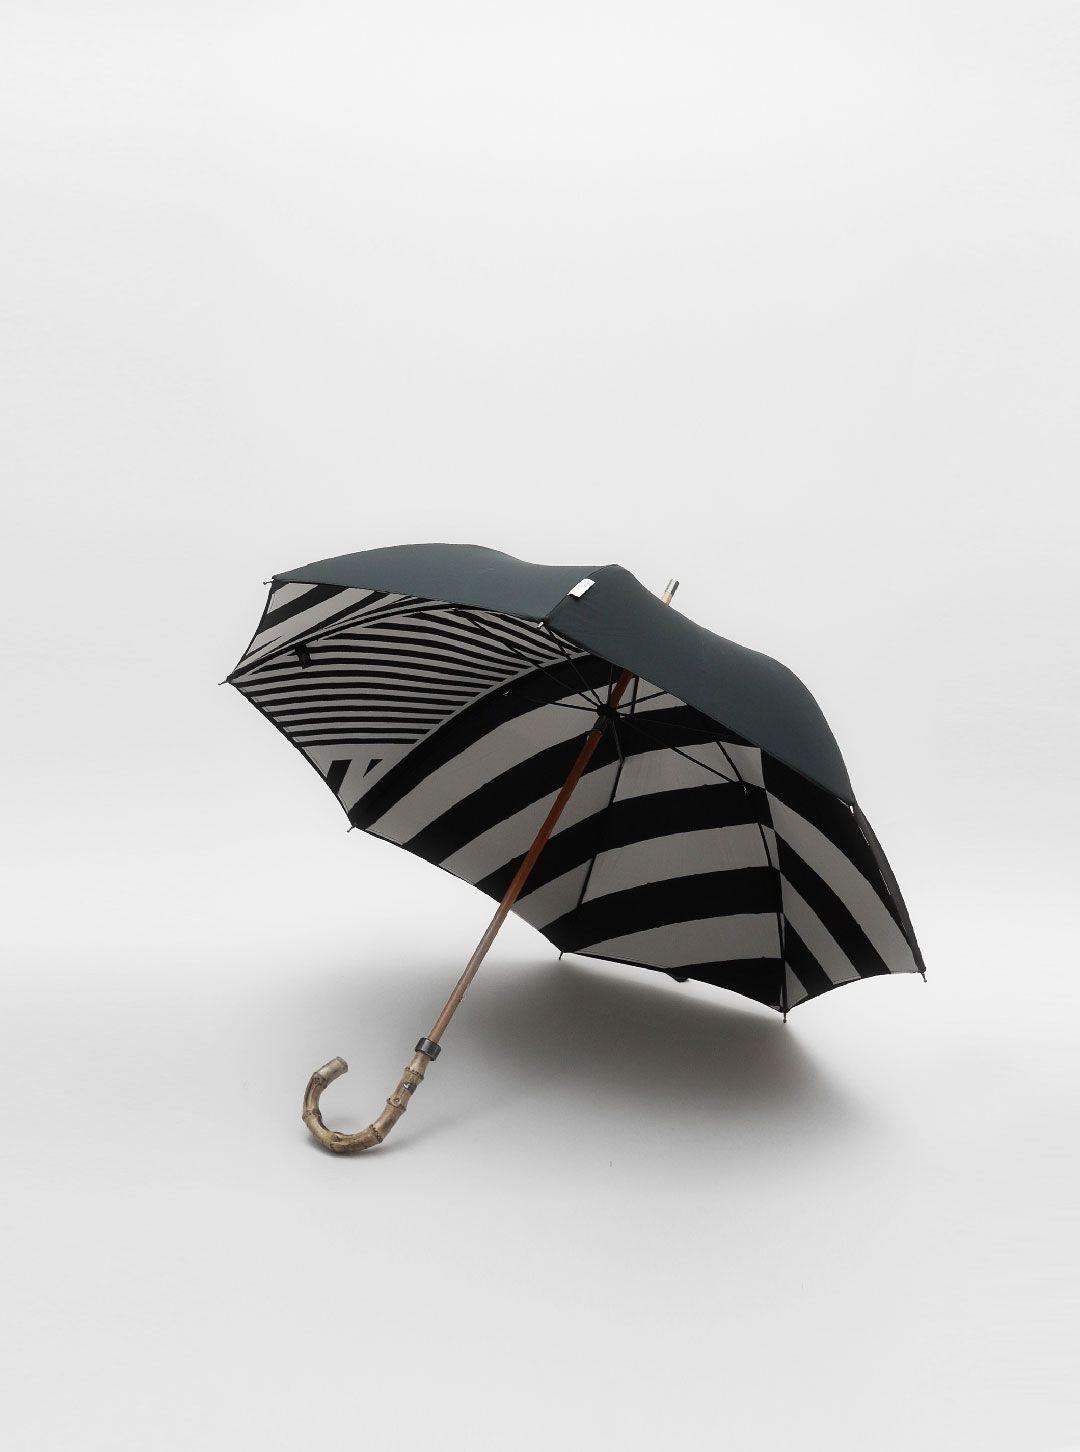 London Undercover Maharishi Umbrella - Present London